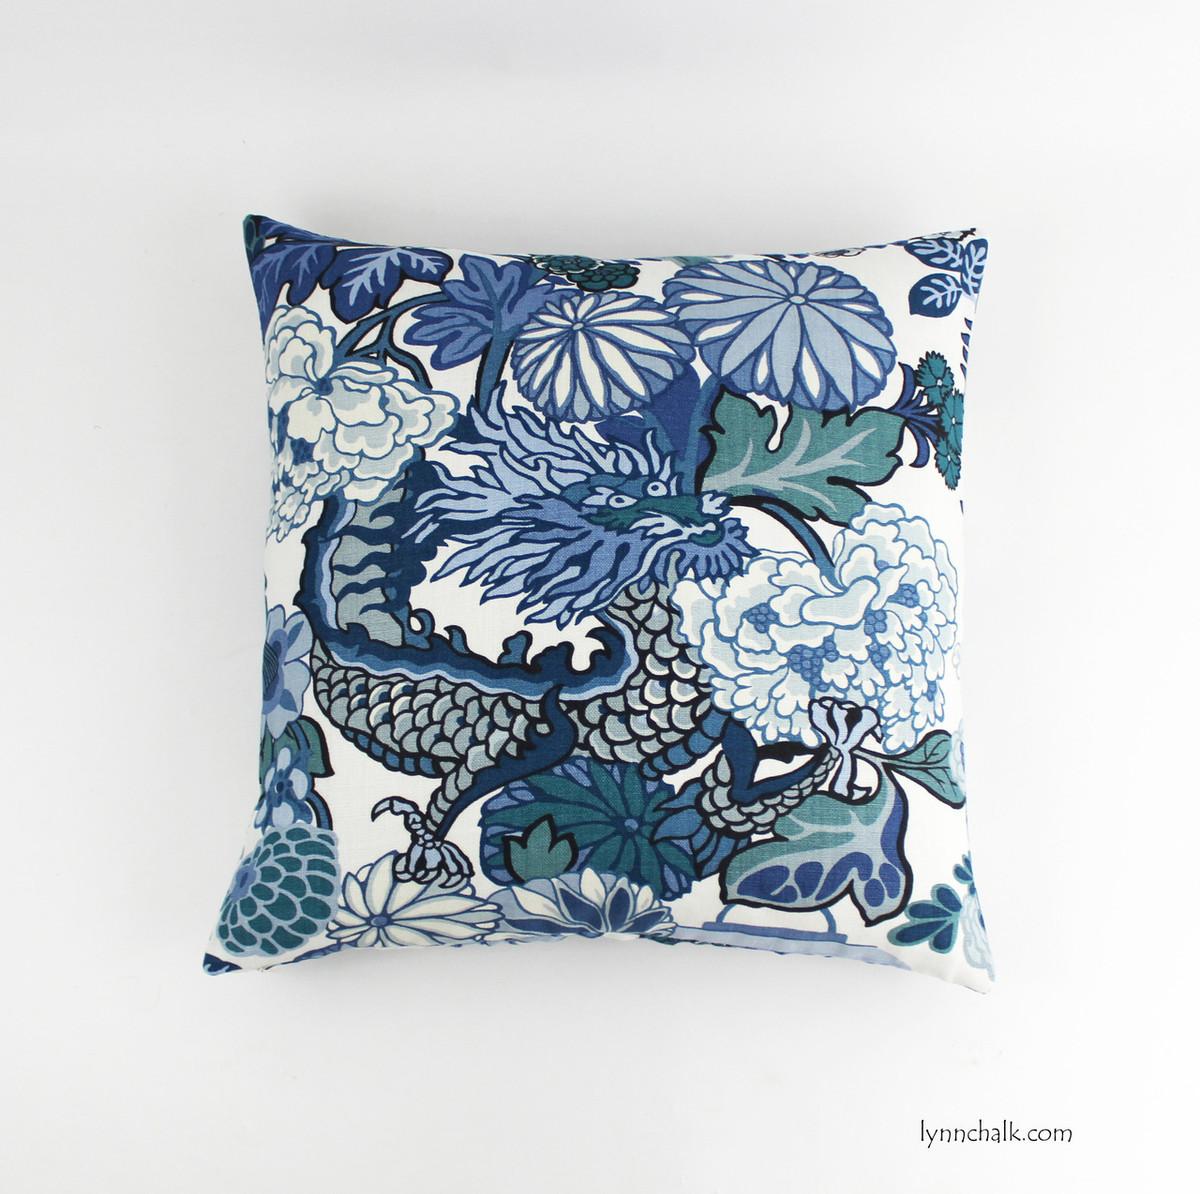 ... Chiang Mai Dragon Pillow In China Blue ...